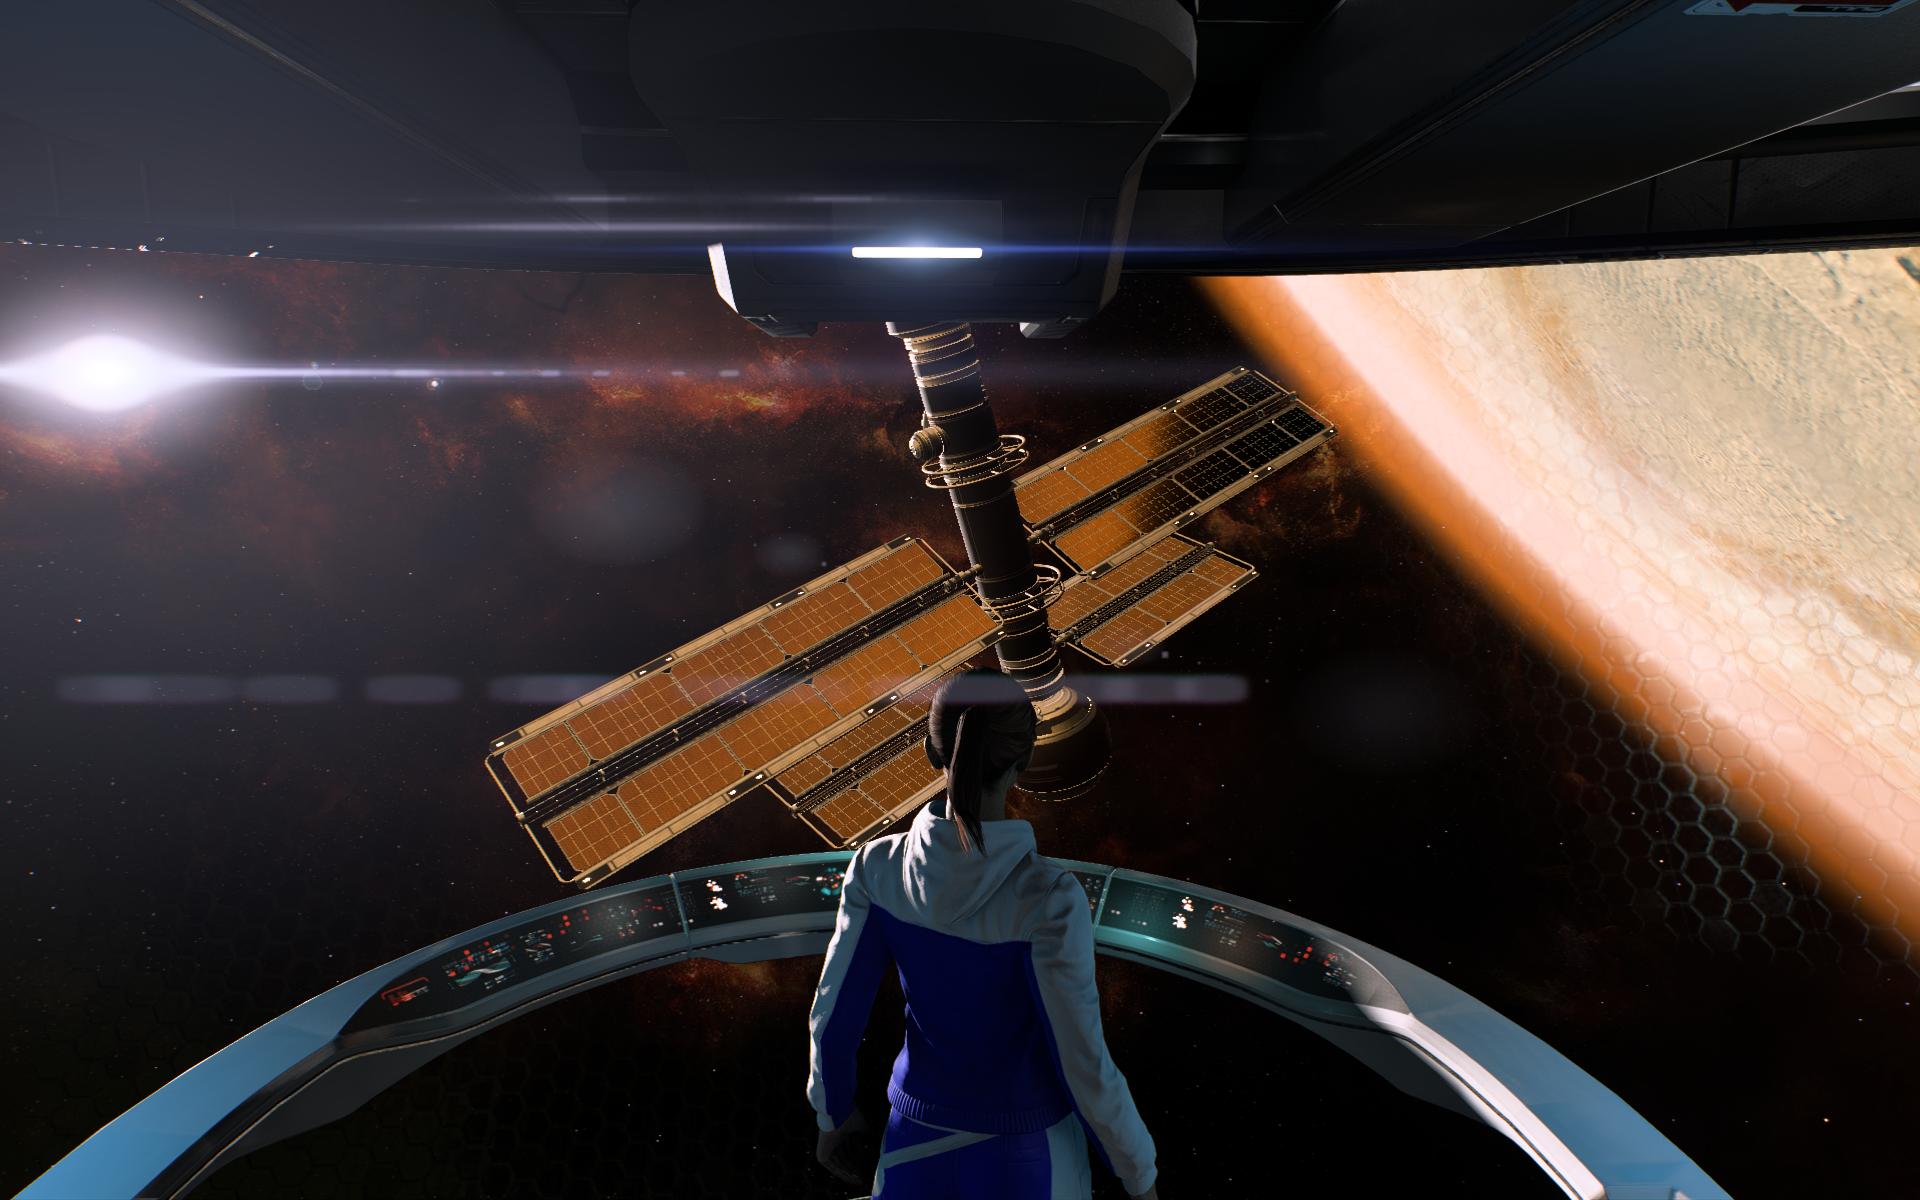 Mass Effect Andromeda Screenshot  - 05.06.40.57.png - Mass Effect: Andromeda